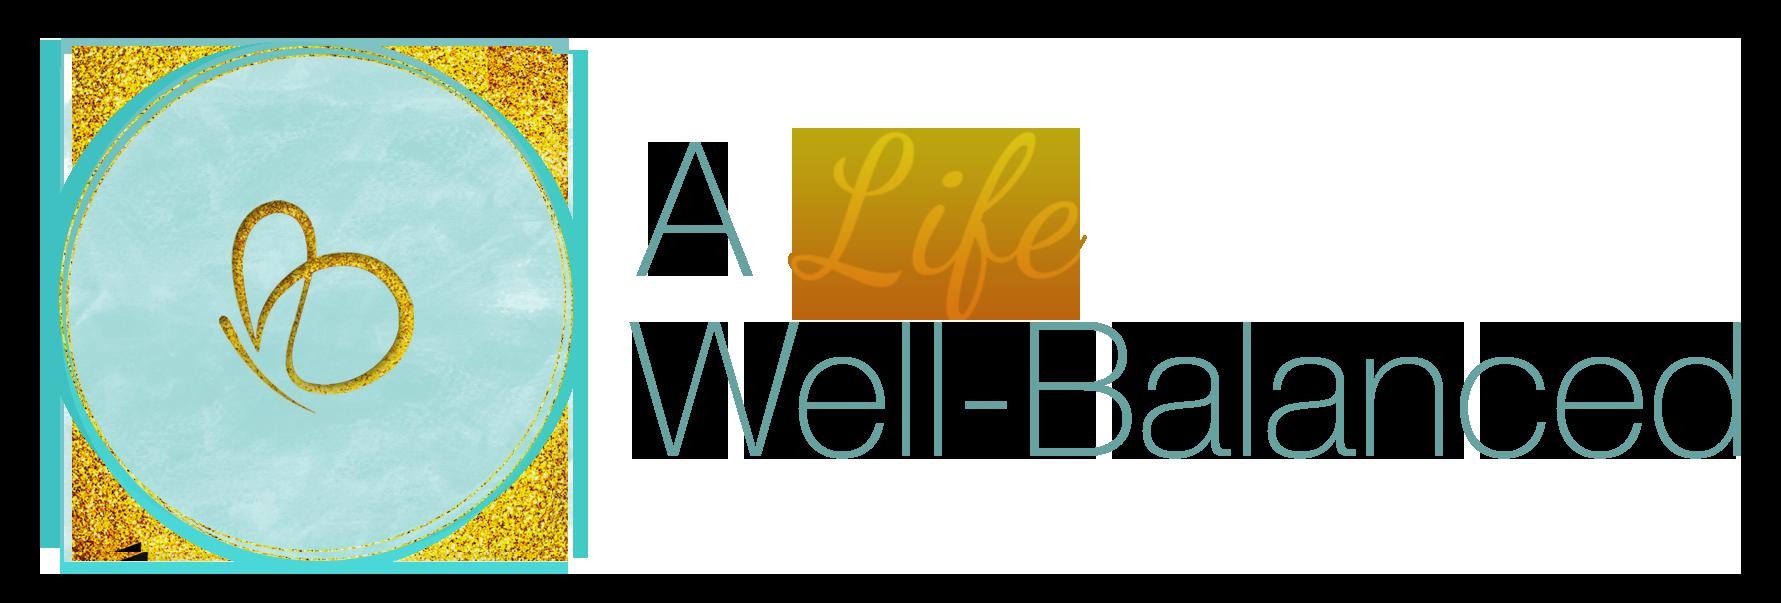 A Life Well-Balanced